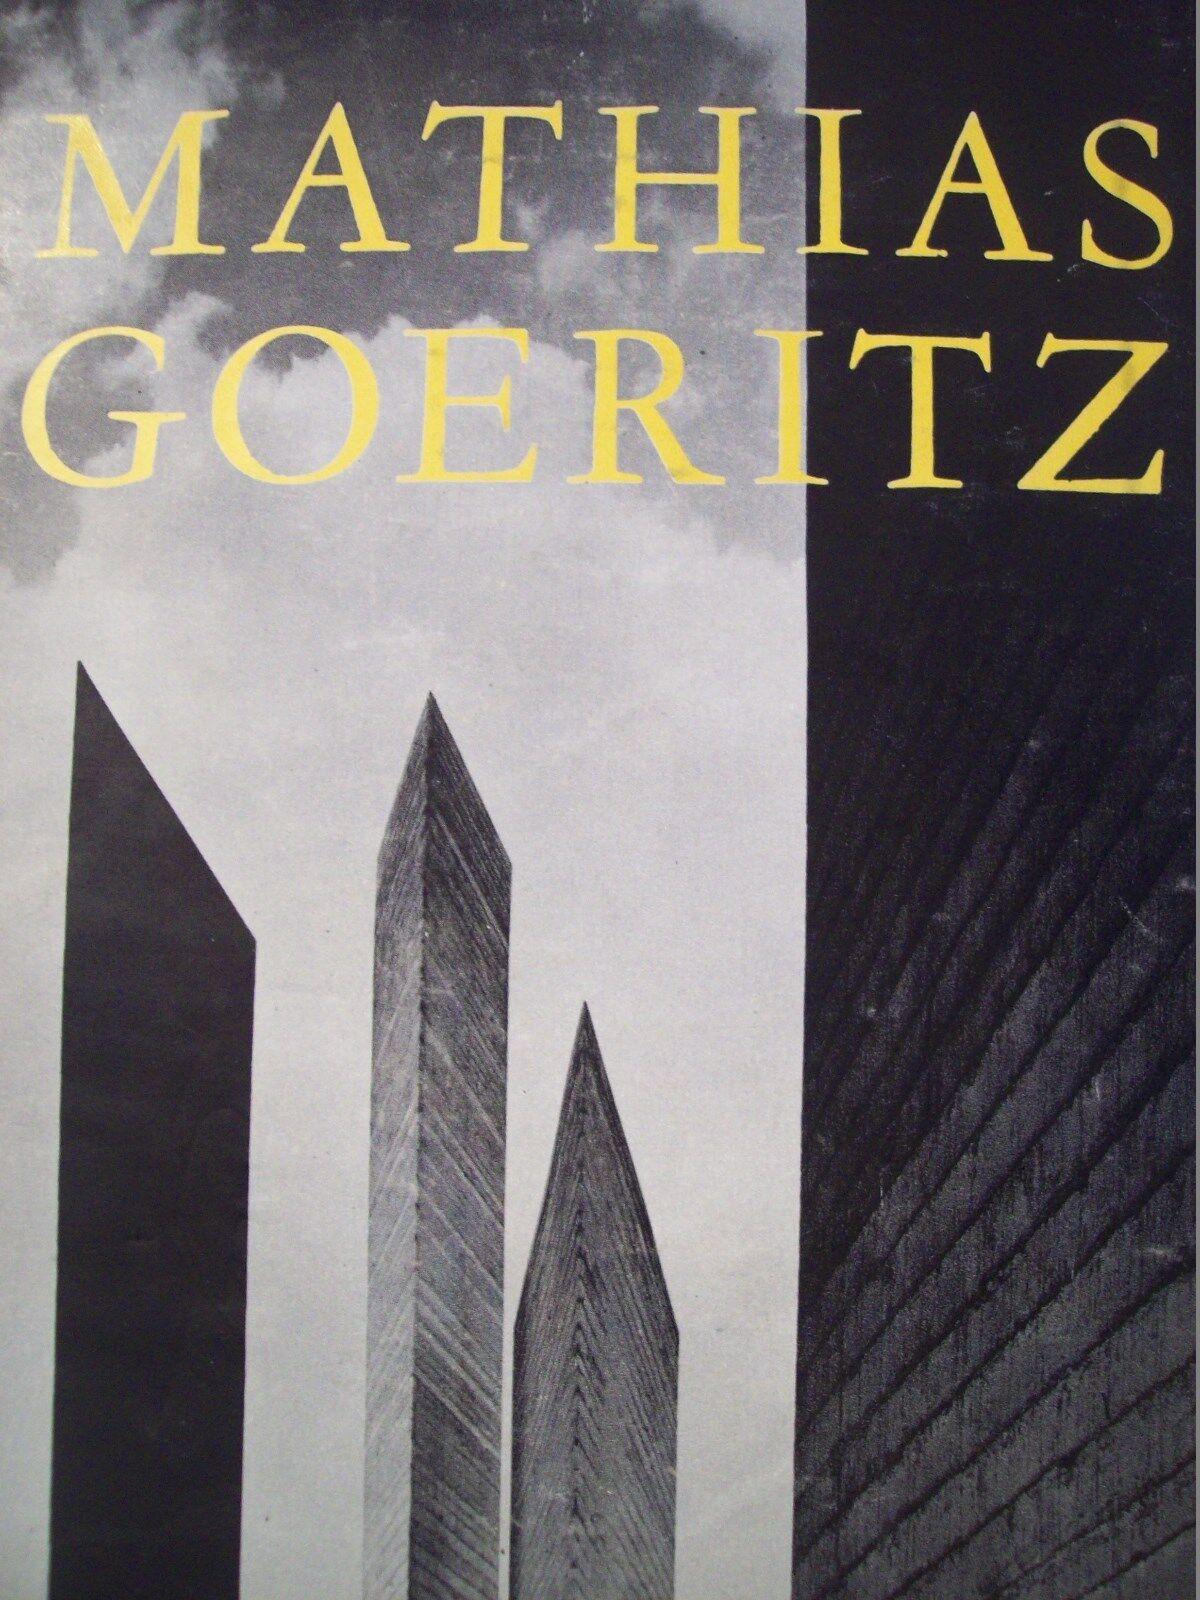 1963 Mexican Art Book MATHIAS GOERITZ